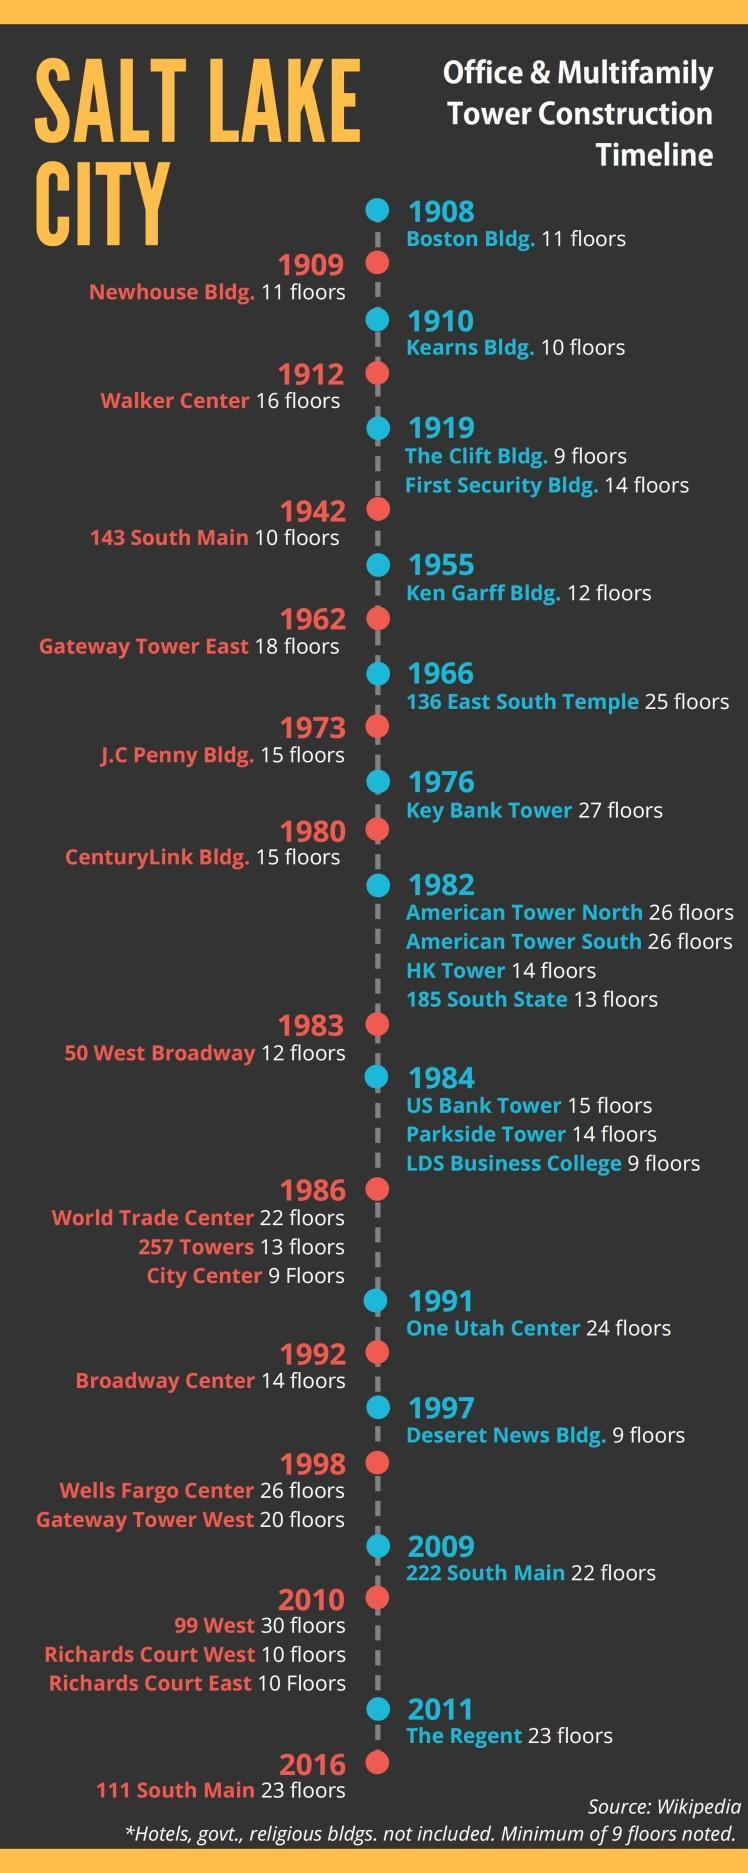 Salt Lake City, Office Multifamily Tower Construction Timeline